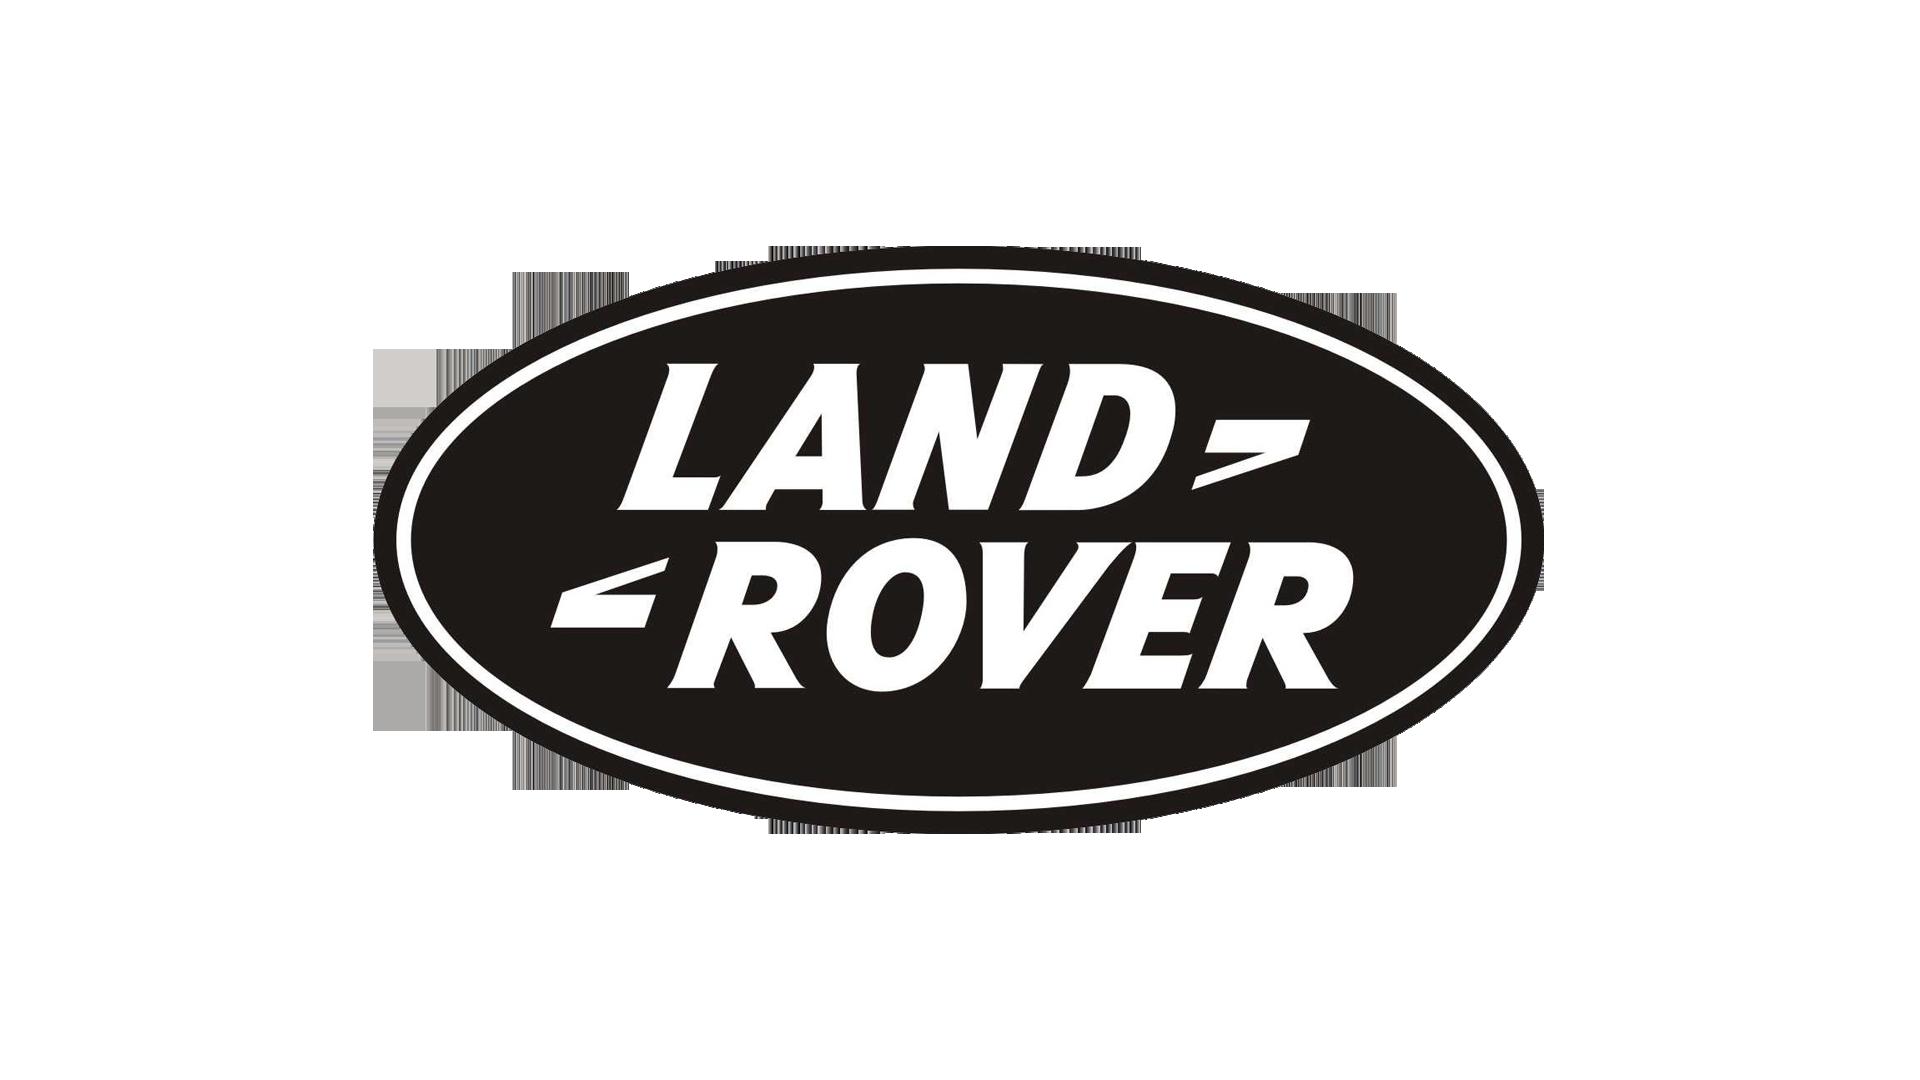 Land Rover Logo >> Land Rover Logo Hd Png Meaning Information Carlogos Org